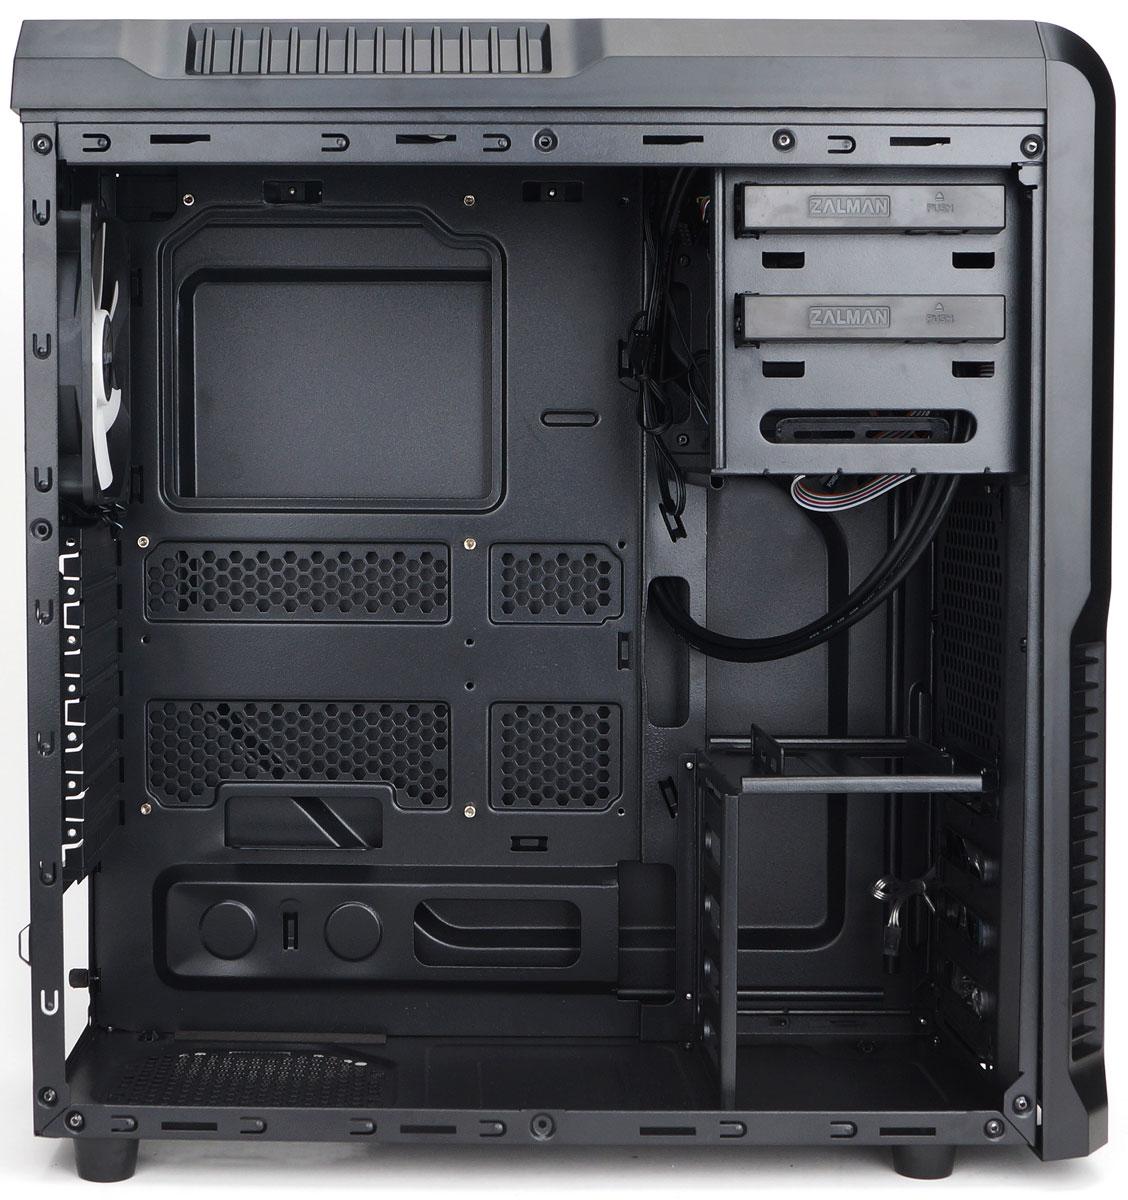 Zalman Z3, Black компьютерный корпус ( 76195 )